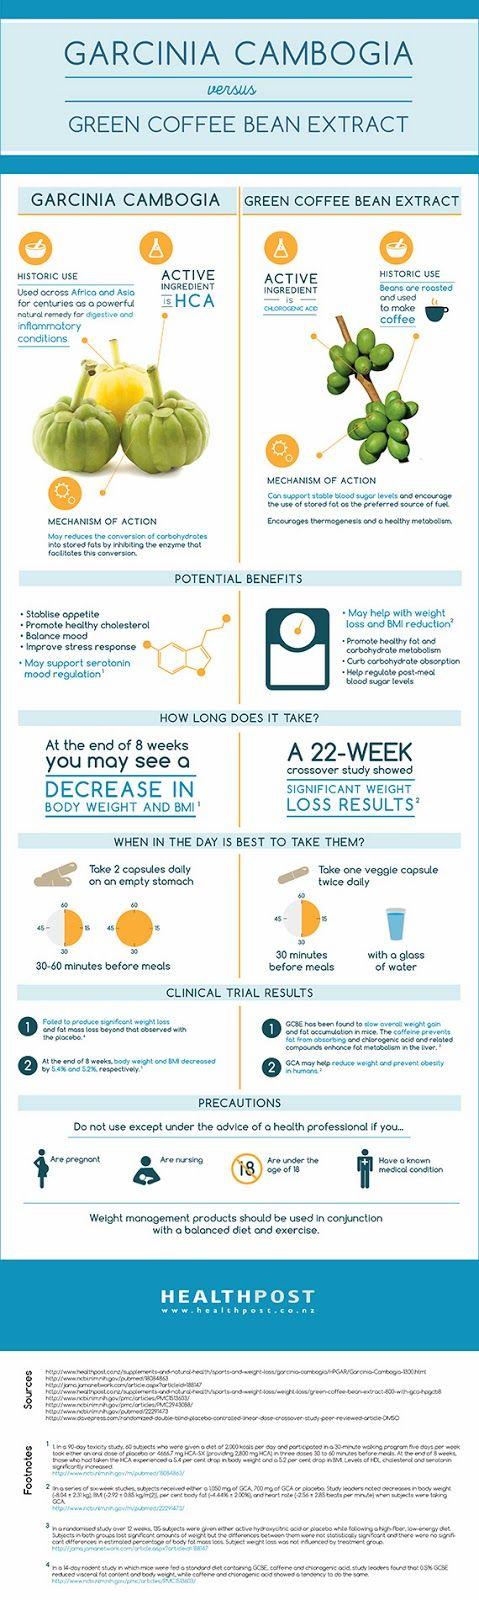 Garcinia Cambogia vs. Green Coffee Bean Extract [Infographic]